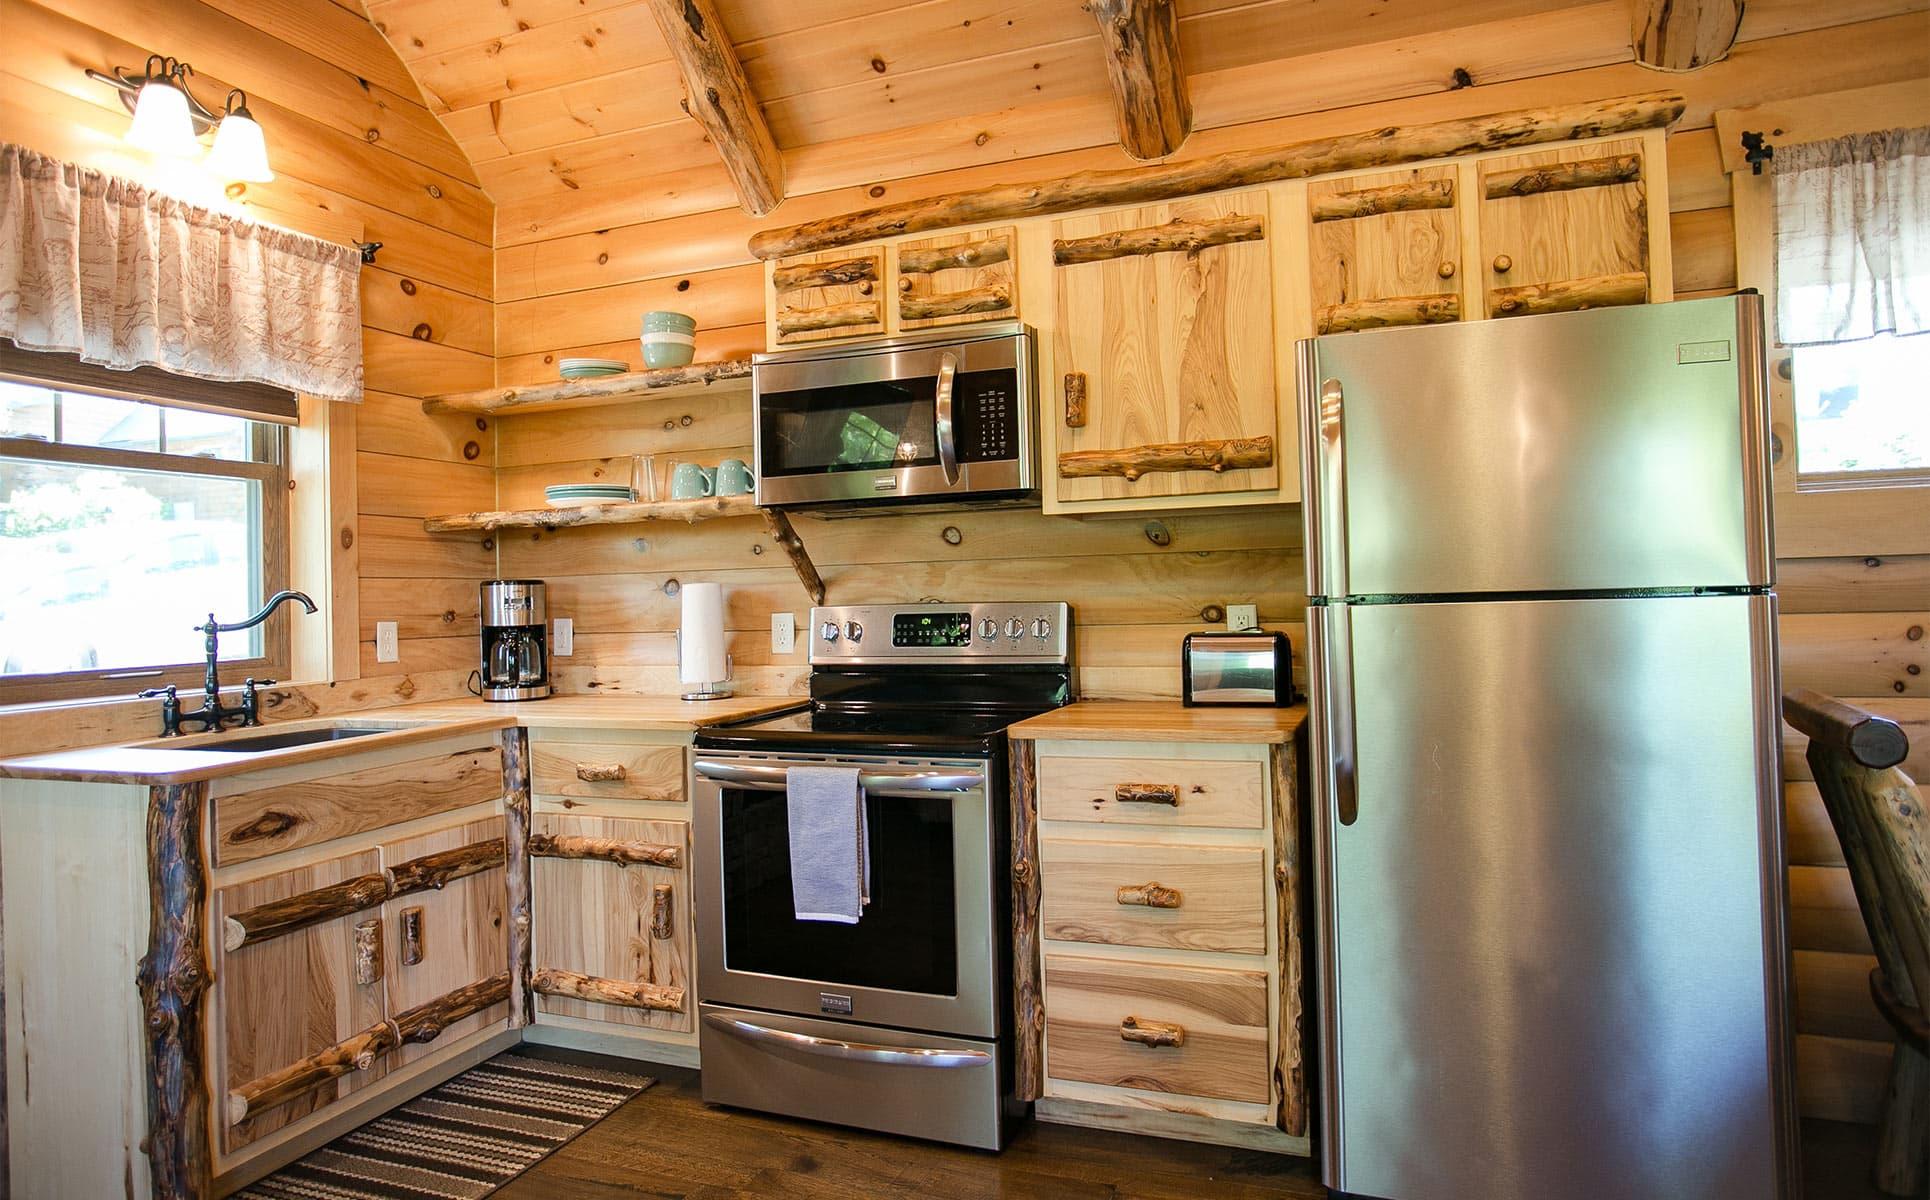 Full Kitcen with range, microwave, and fridge